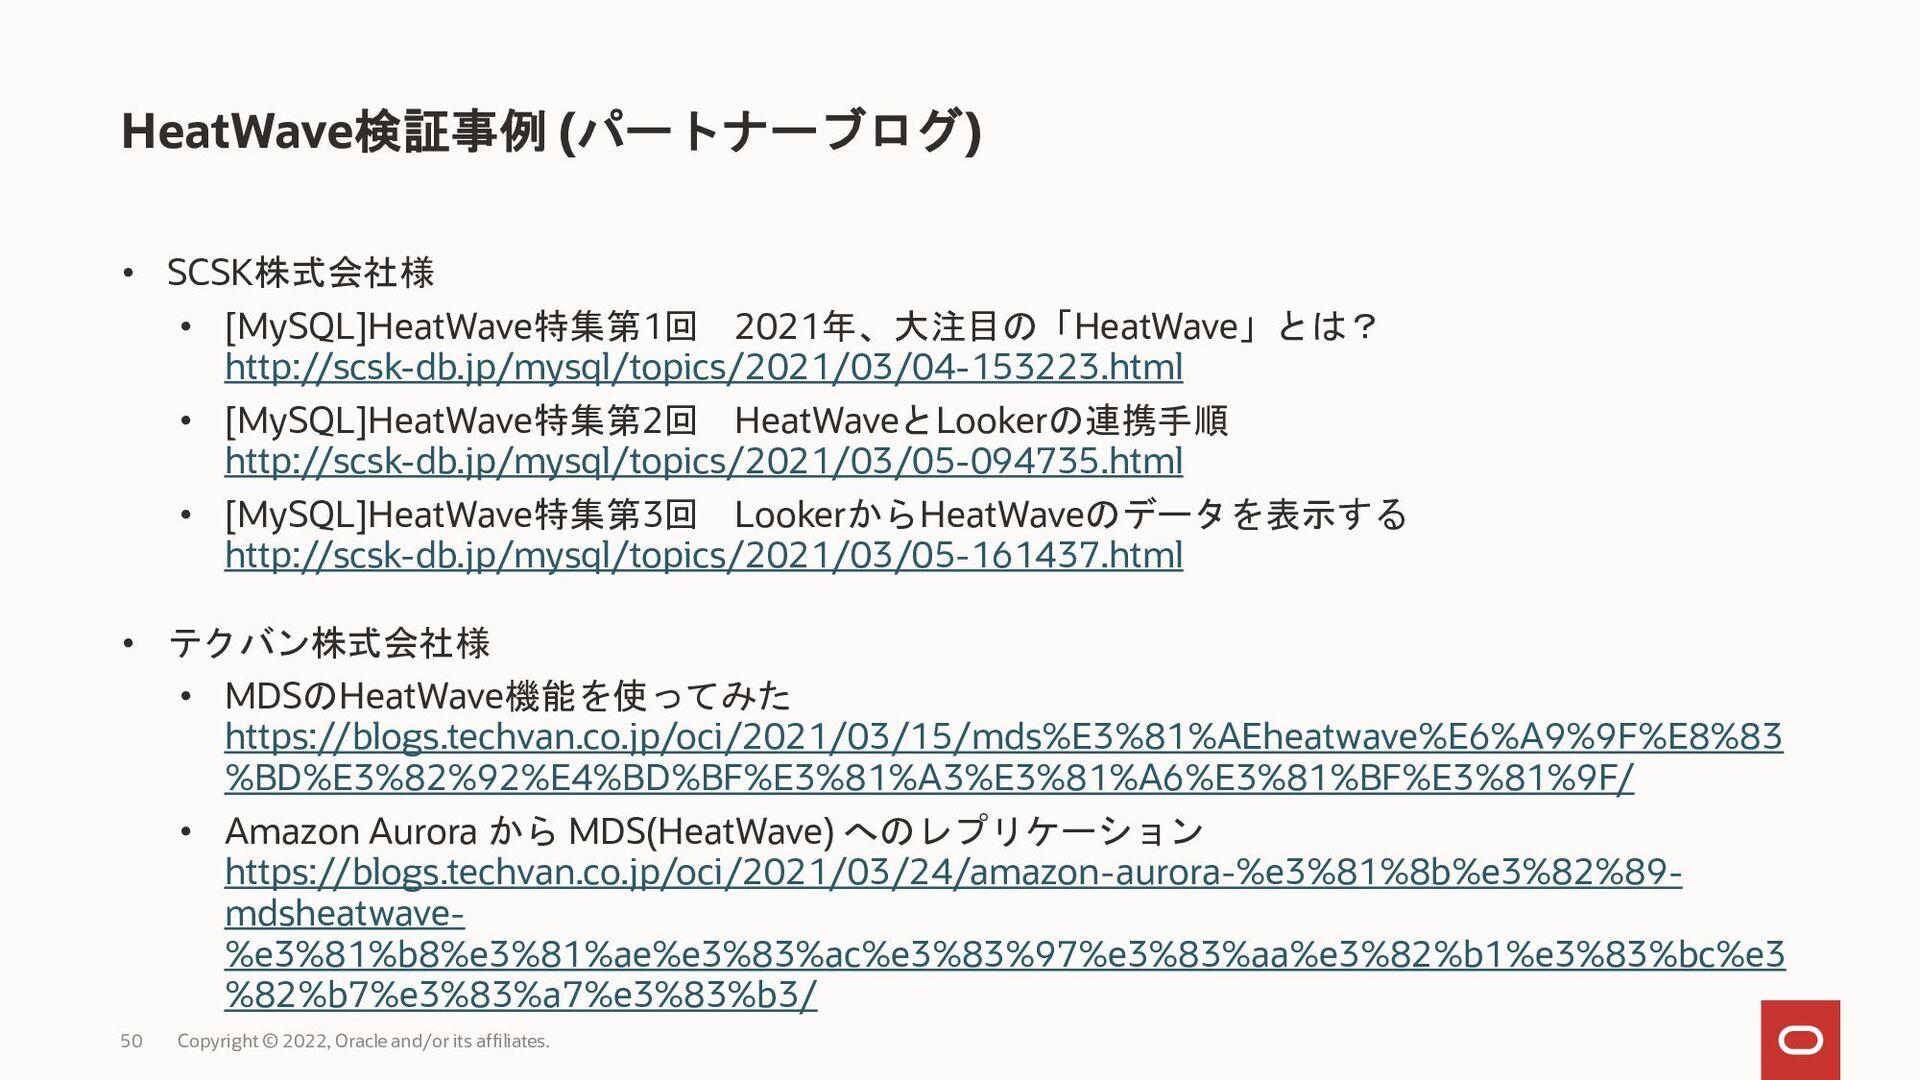 • Support for MySQL version 8.0.26 (July 23, 20...